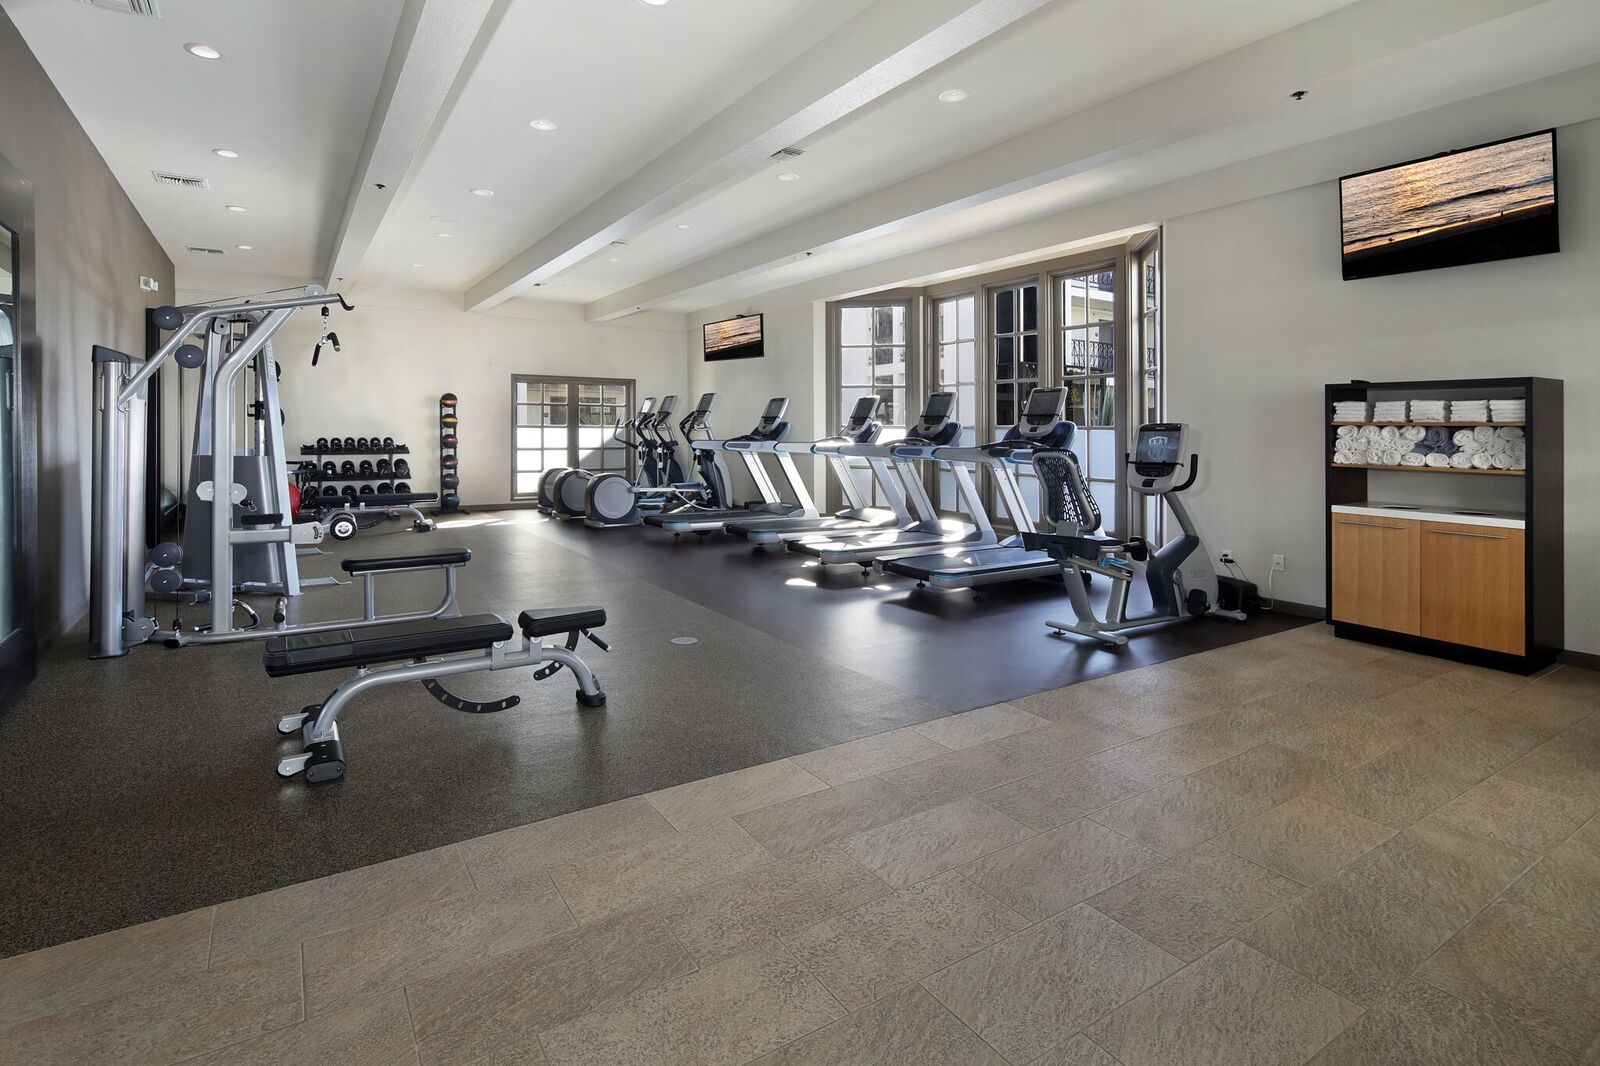 PLMDR - gym